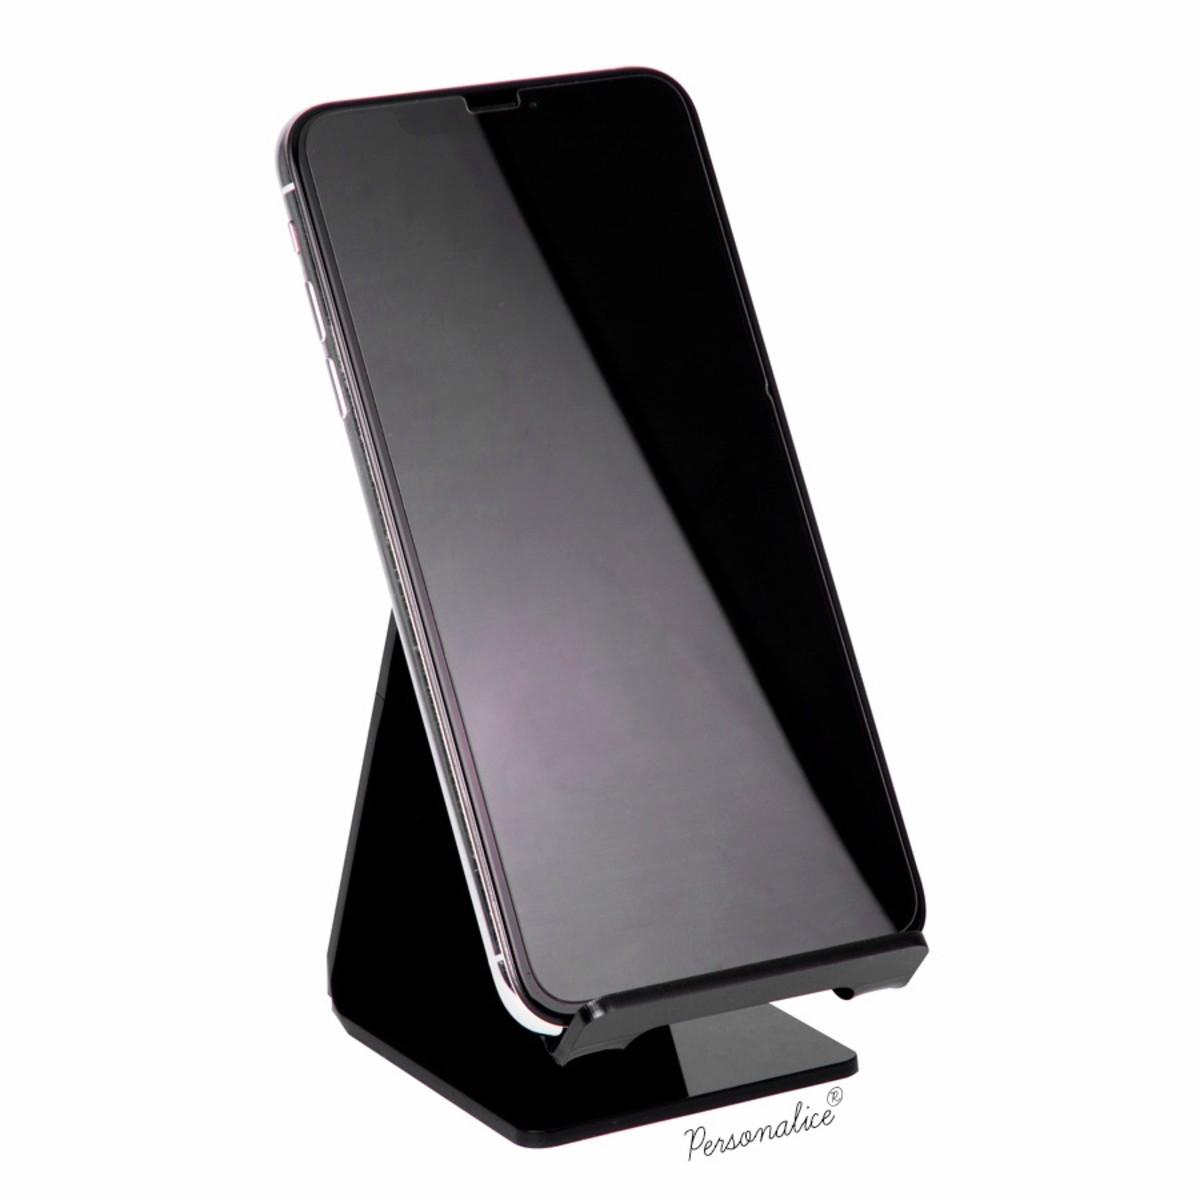 Suporte Celular Smartphone iPhone Display Mesa Universal no Elo7 ...